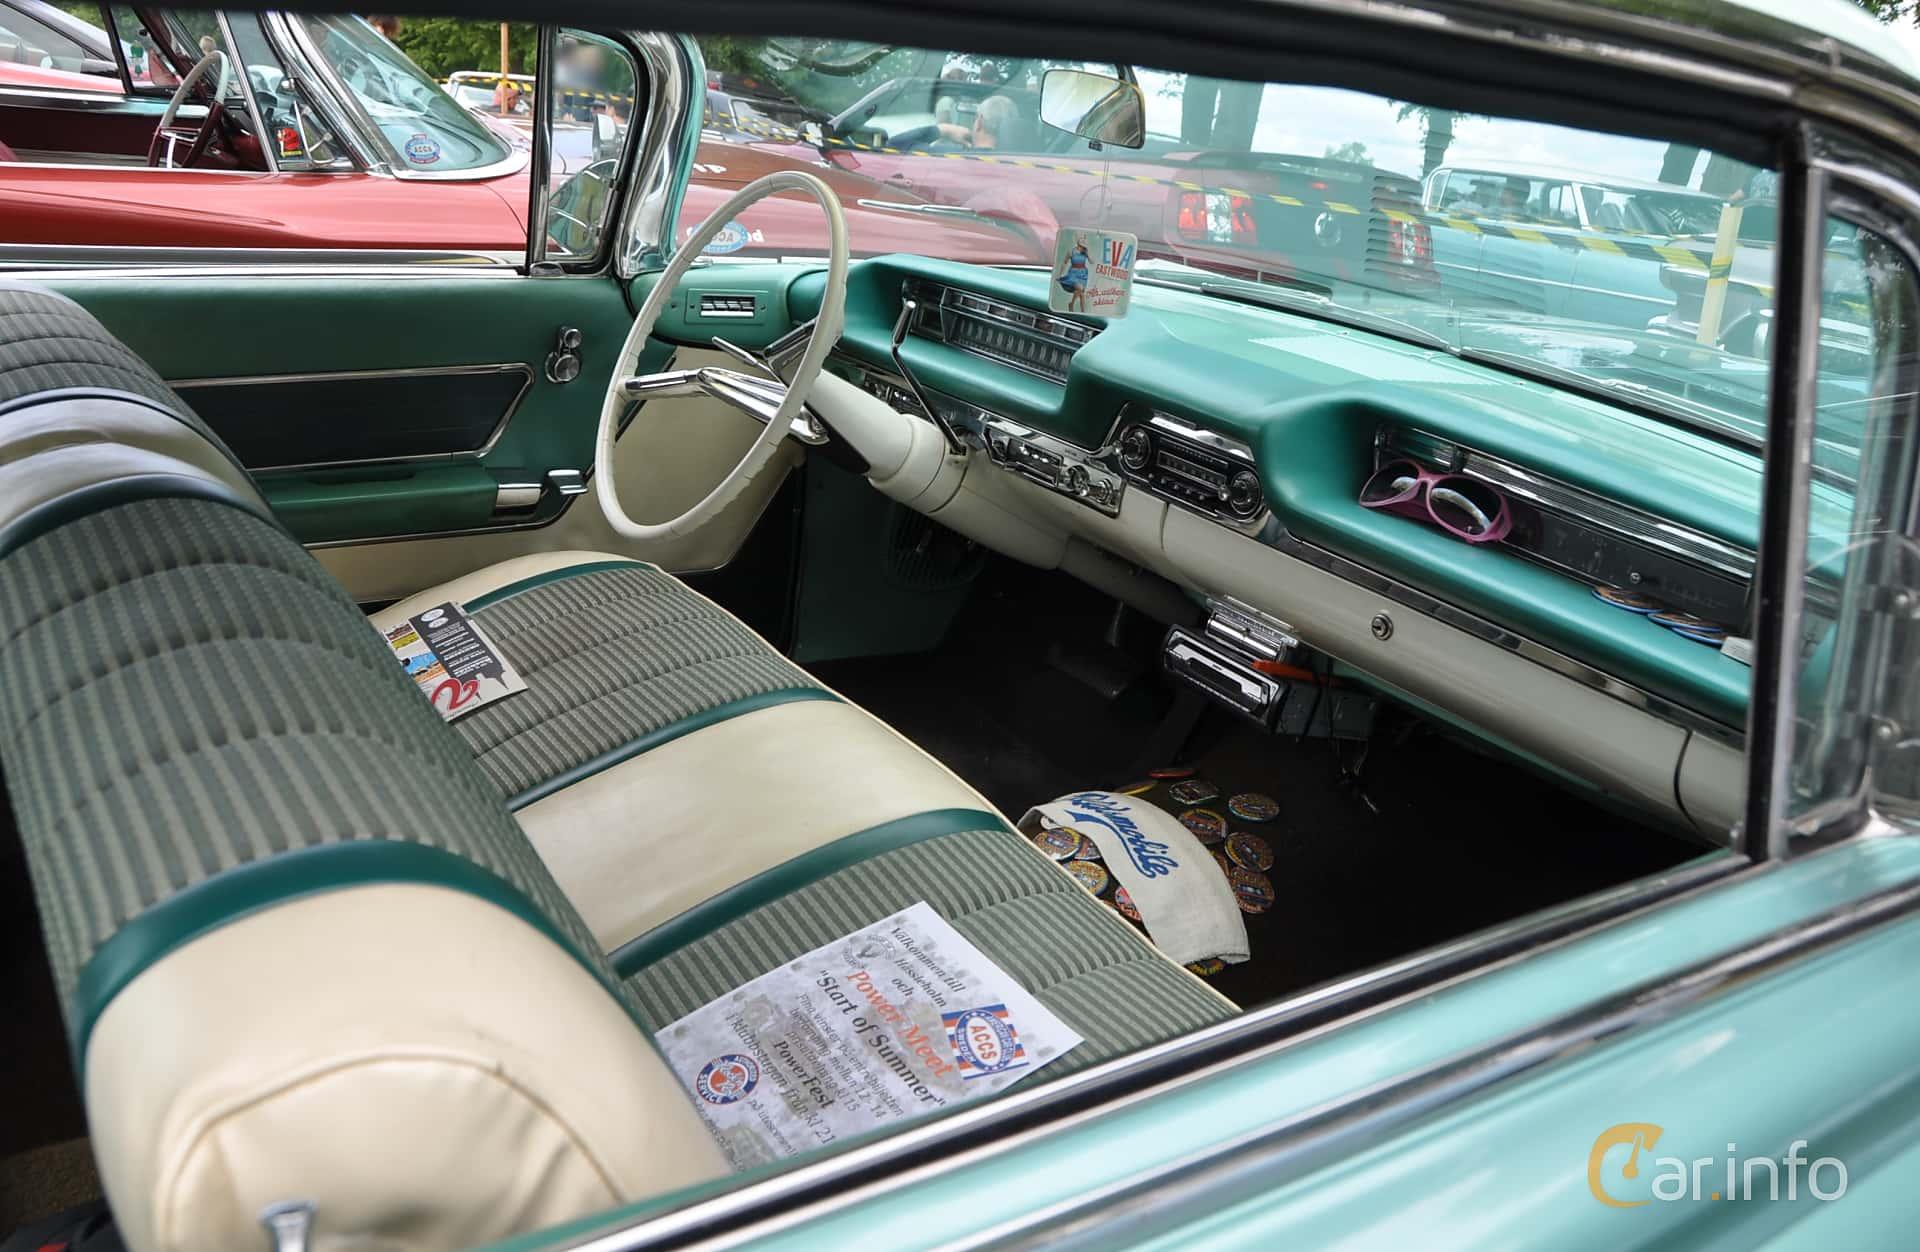 Oldsmobile Ninety-Eight Holiday SceniCoupé 6.5 V8 Hydra-Matic, 320hp, 1959 at Hässleholm Power Start of Summer Meet 2016